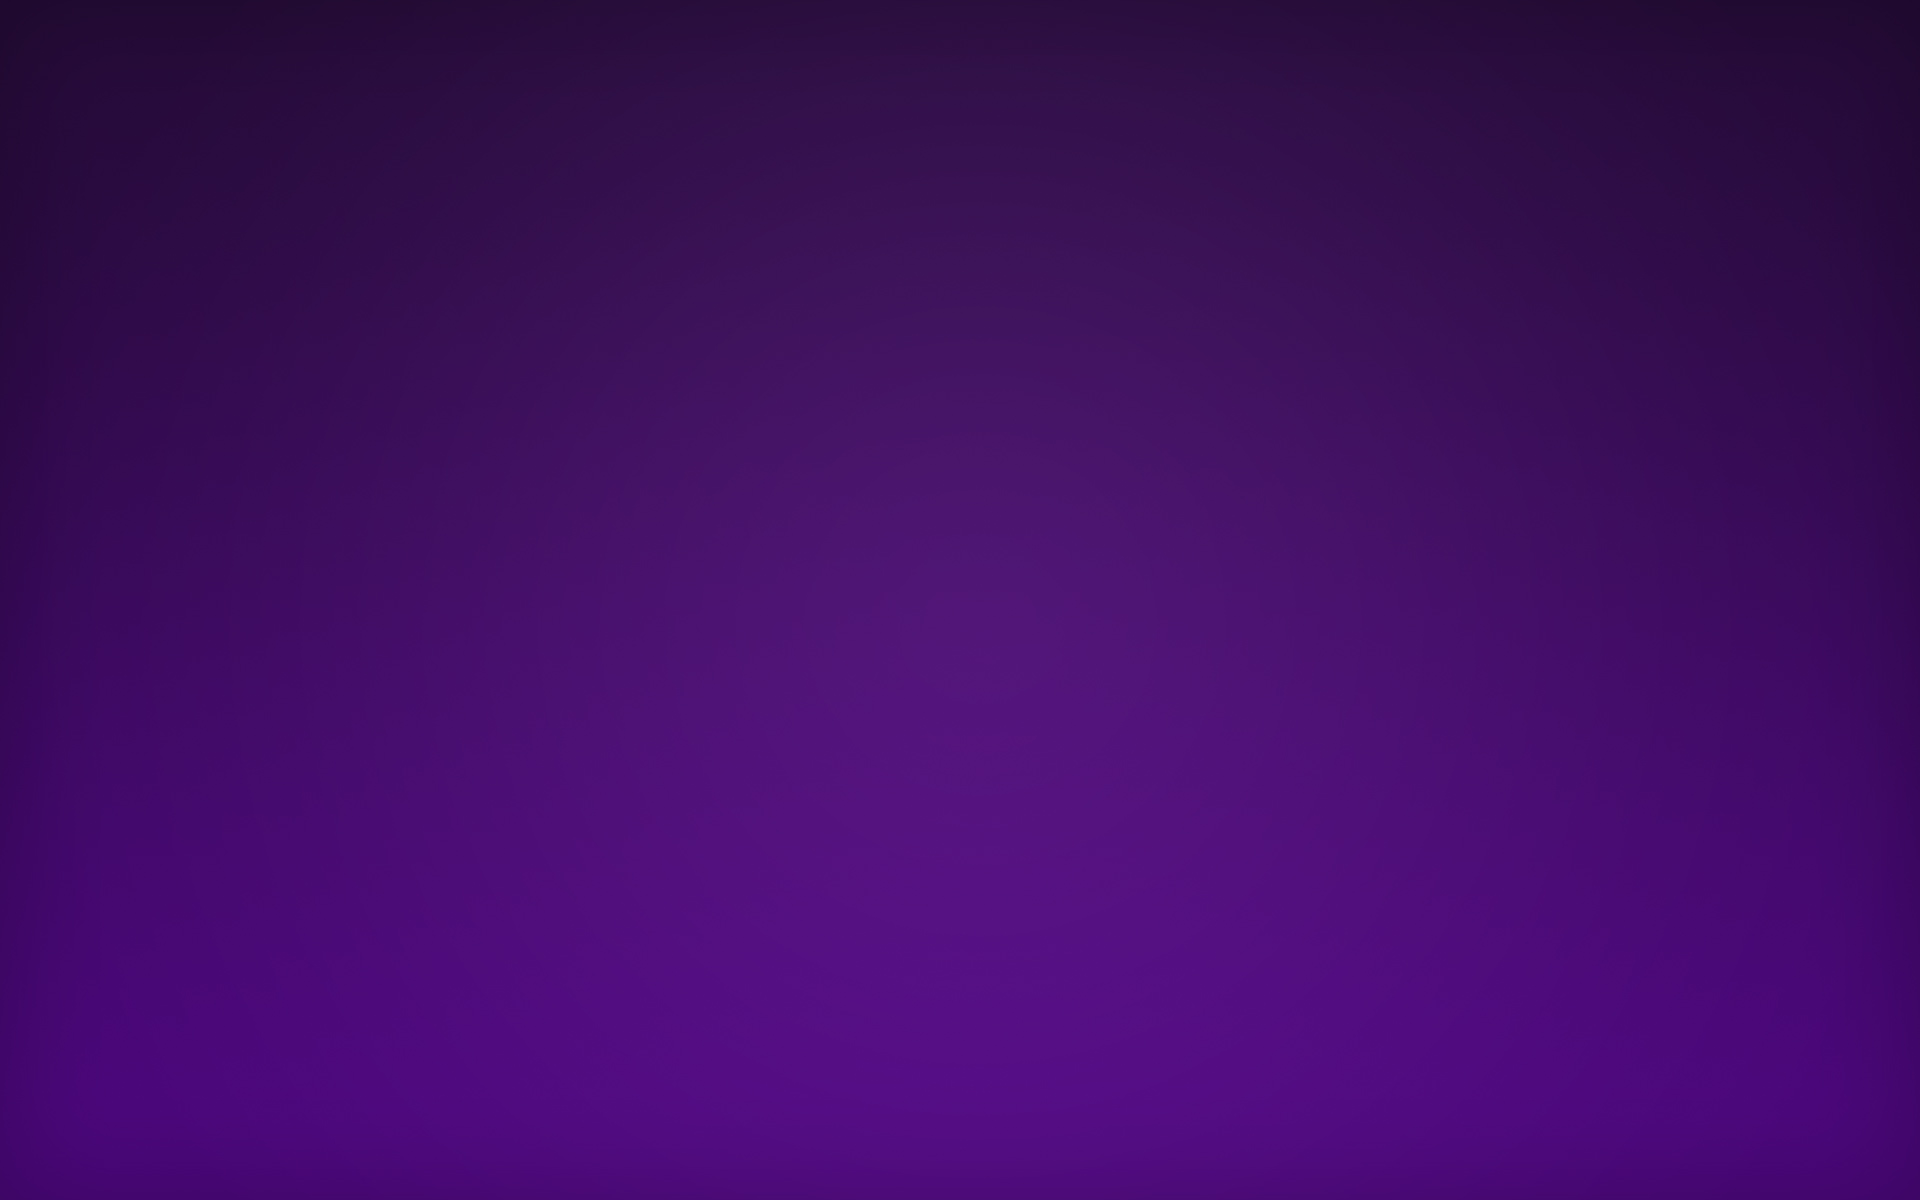 wallpaper wallpapers istatmenus purple computer bjango menus 1920x1200